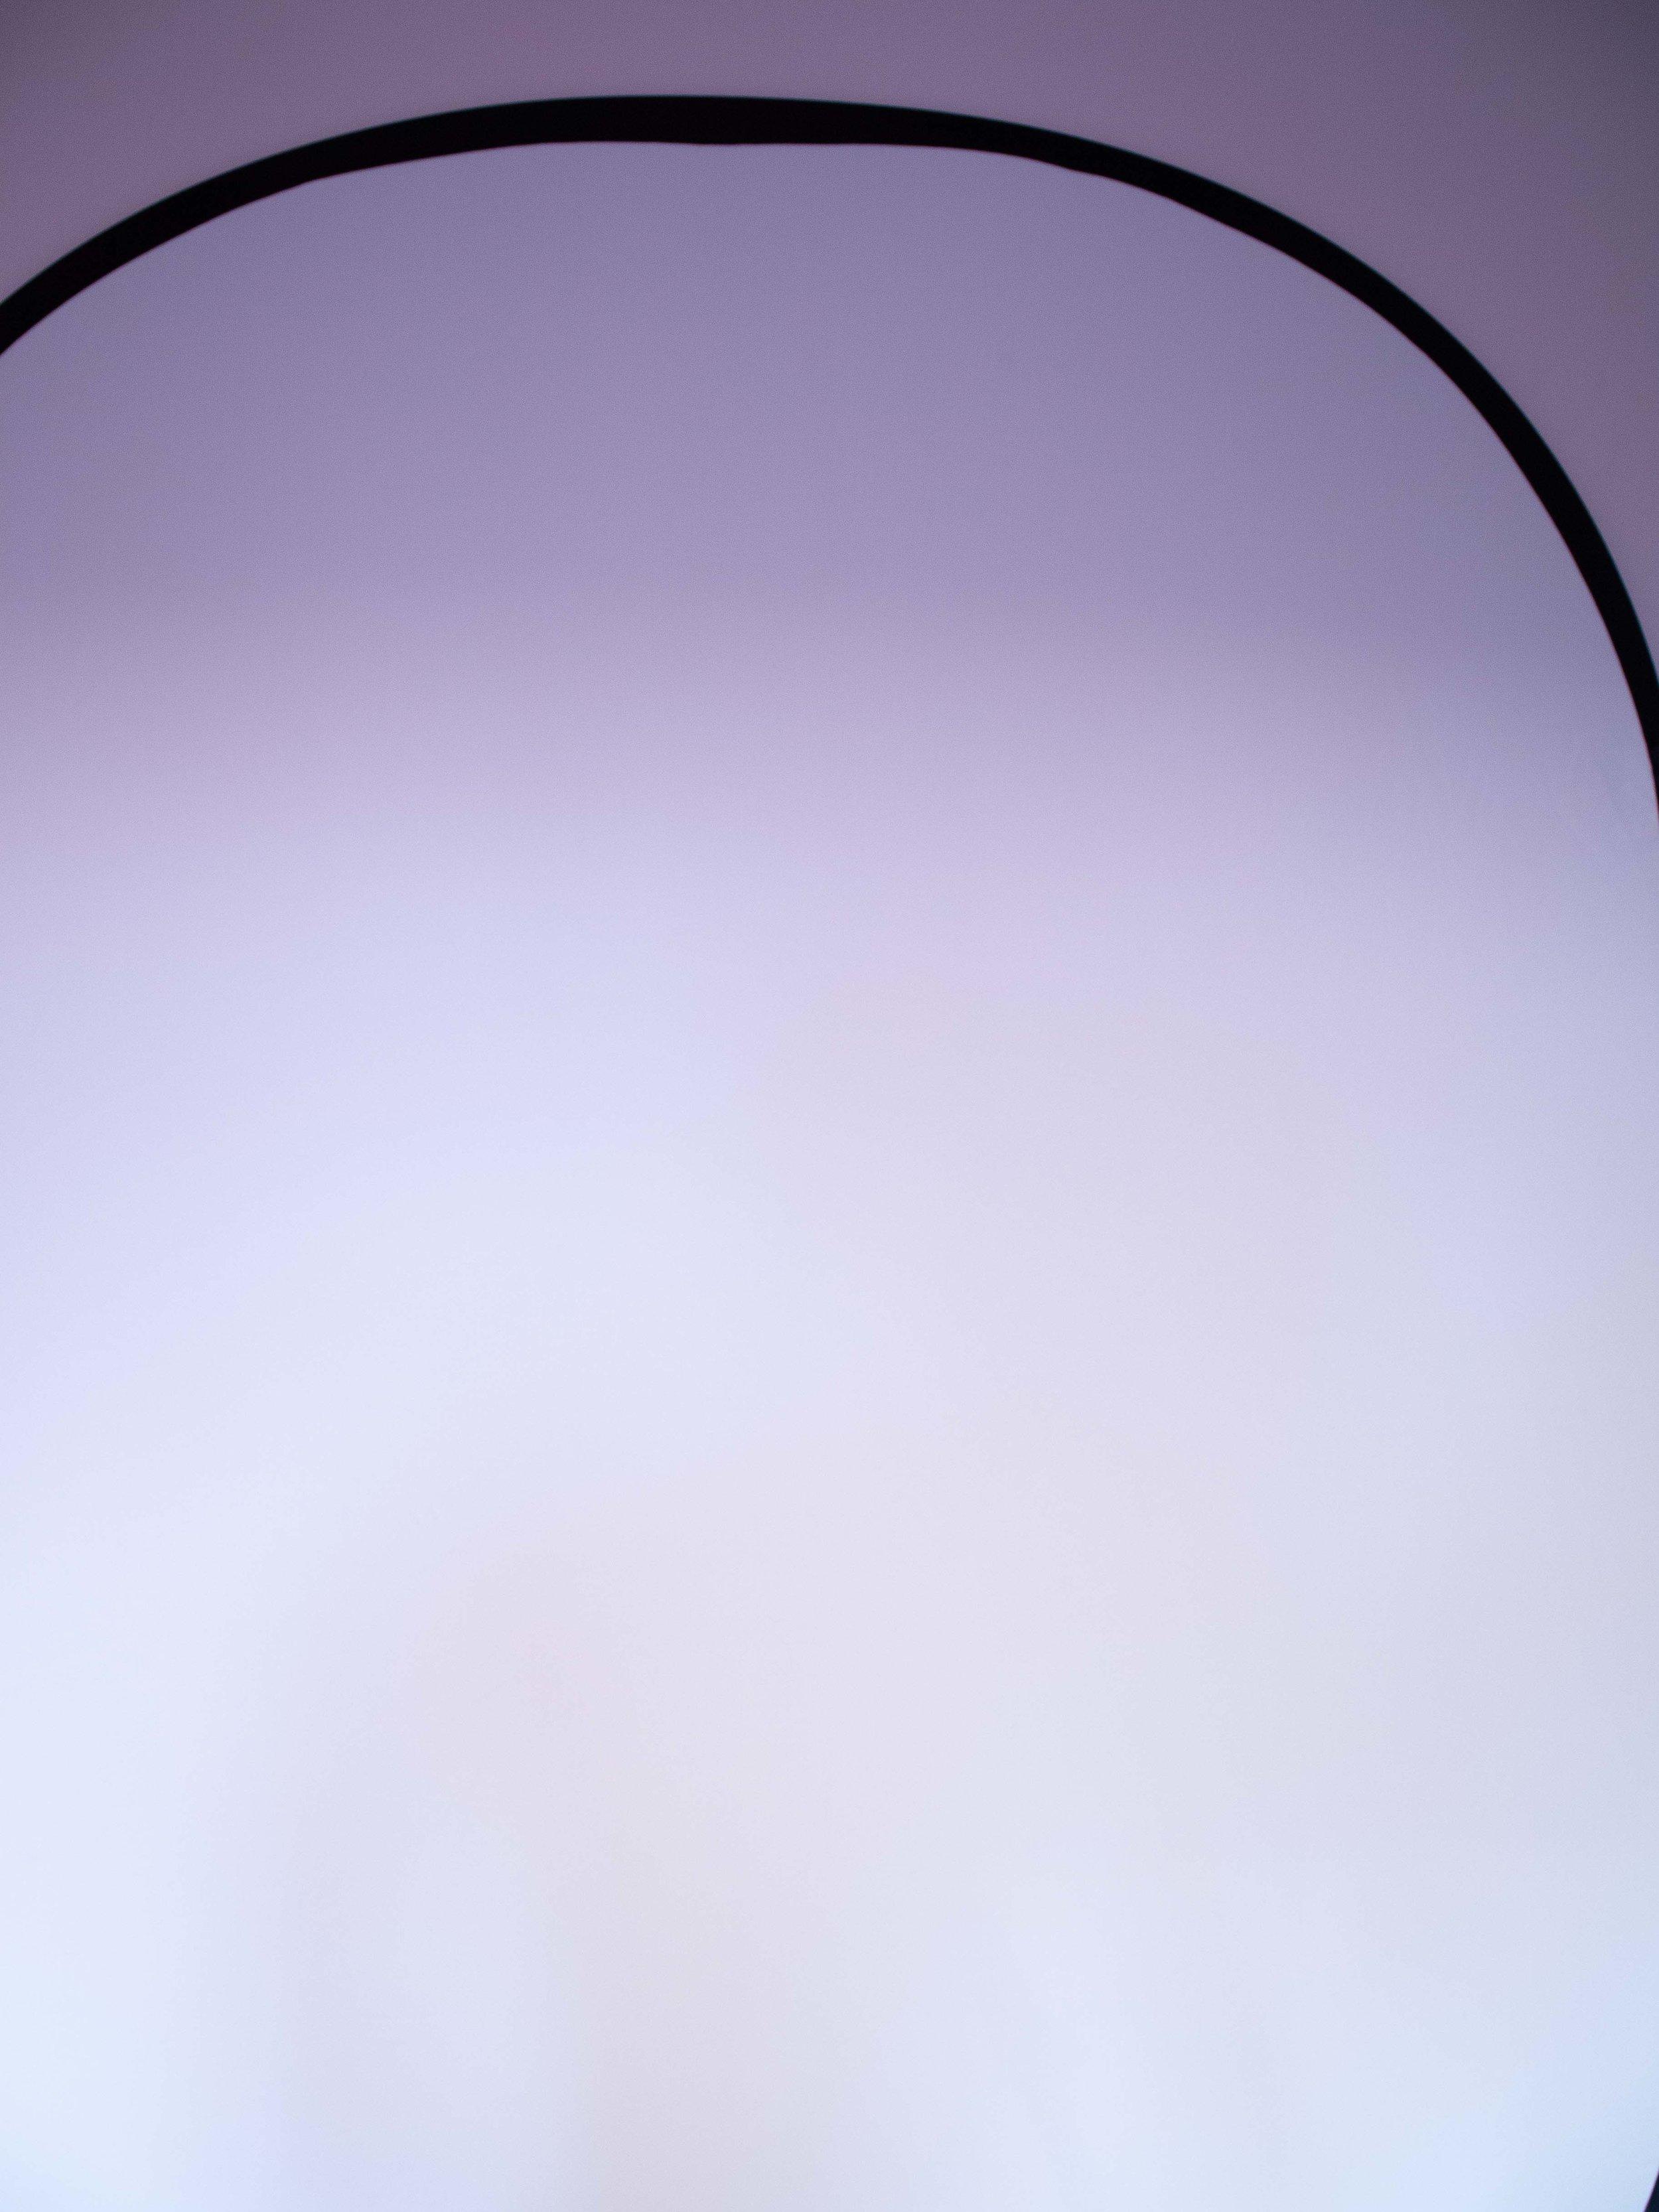 Filter Test Cokin vs 84.5mm (6 of 6).jpg